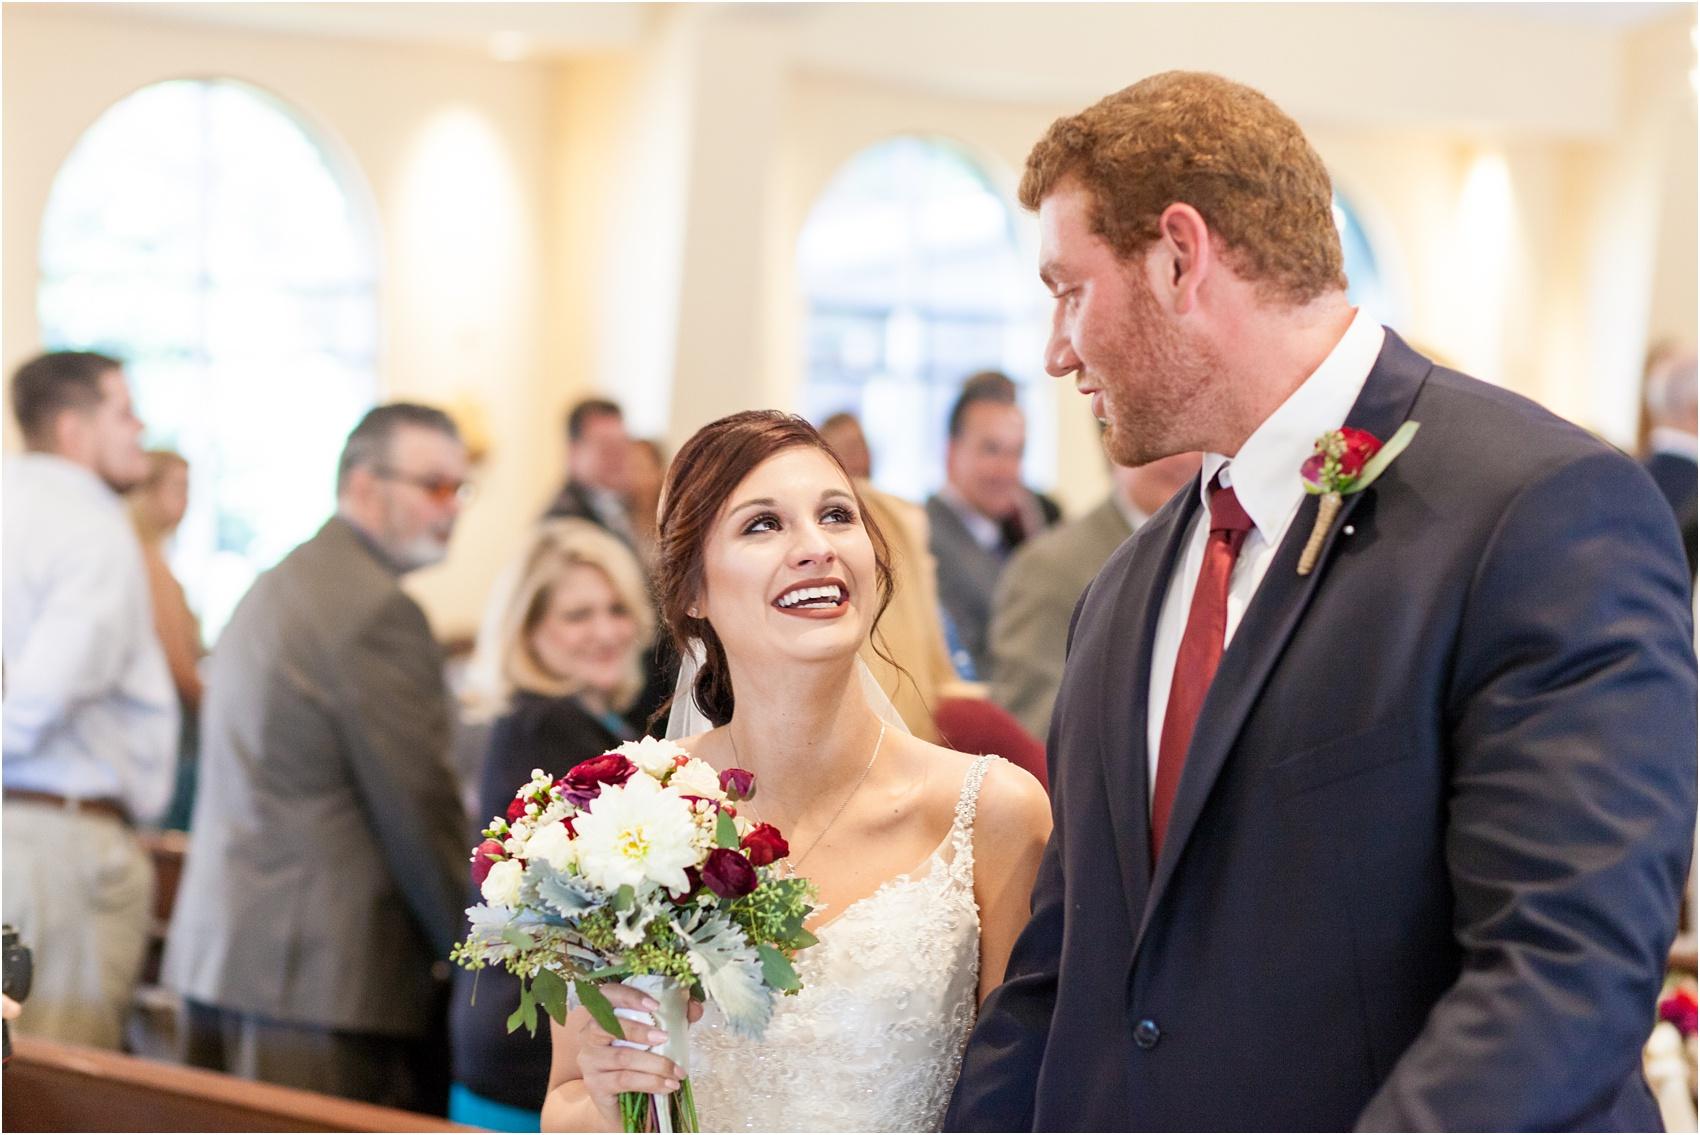 Savannah Eve Photography- May Wedding- Blog-28.jpg